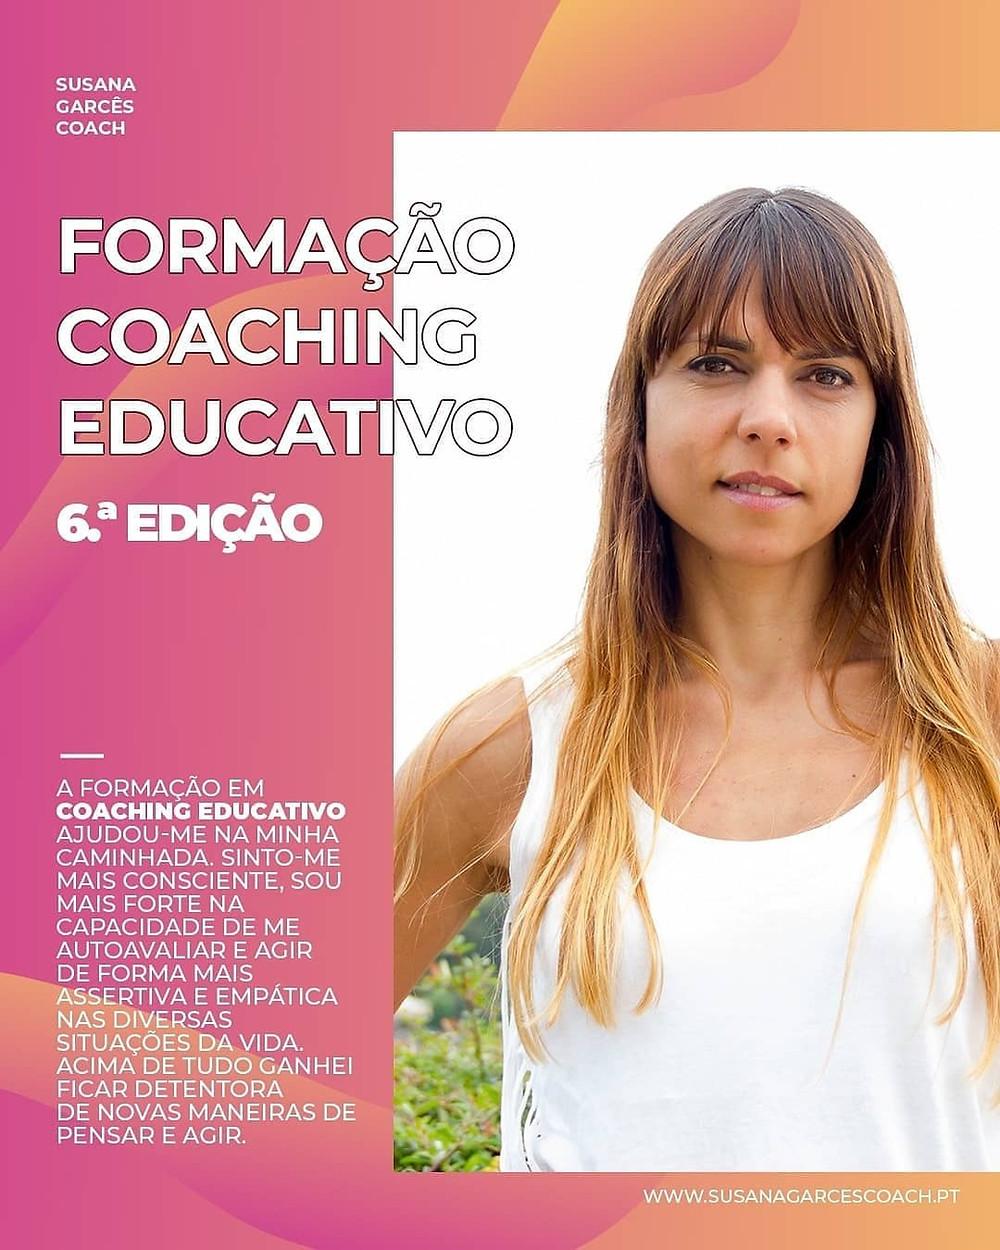 #coachsusanafarinhogarces #FormaçãoCoachingEducativo #ajudaraaprenderaaprender #famílias #família #educadores #professores